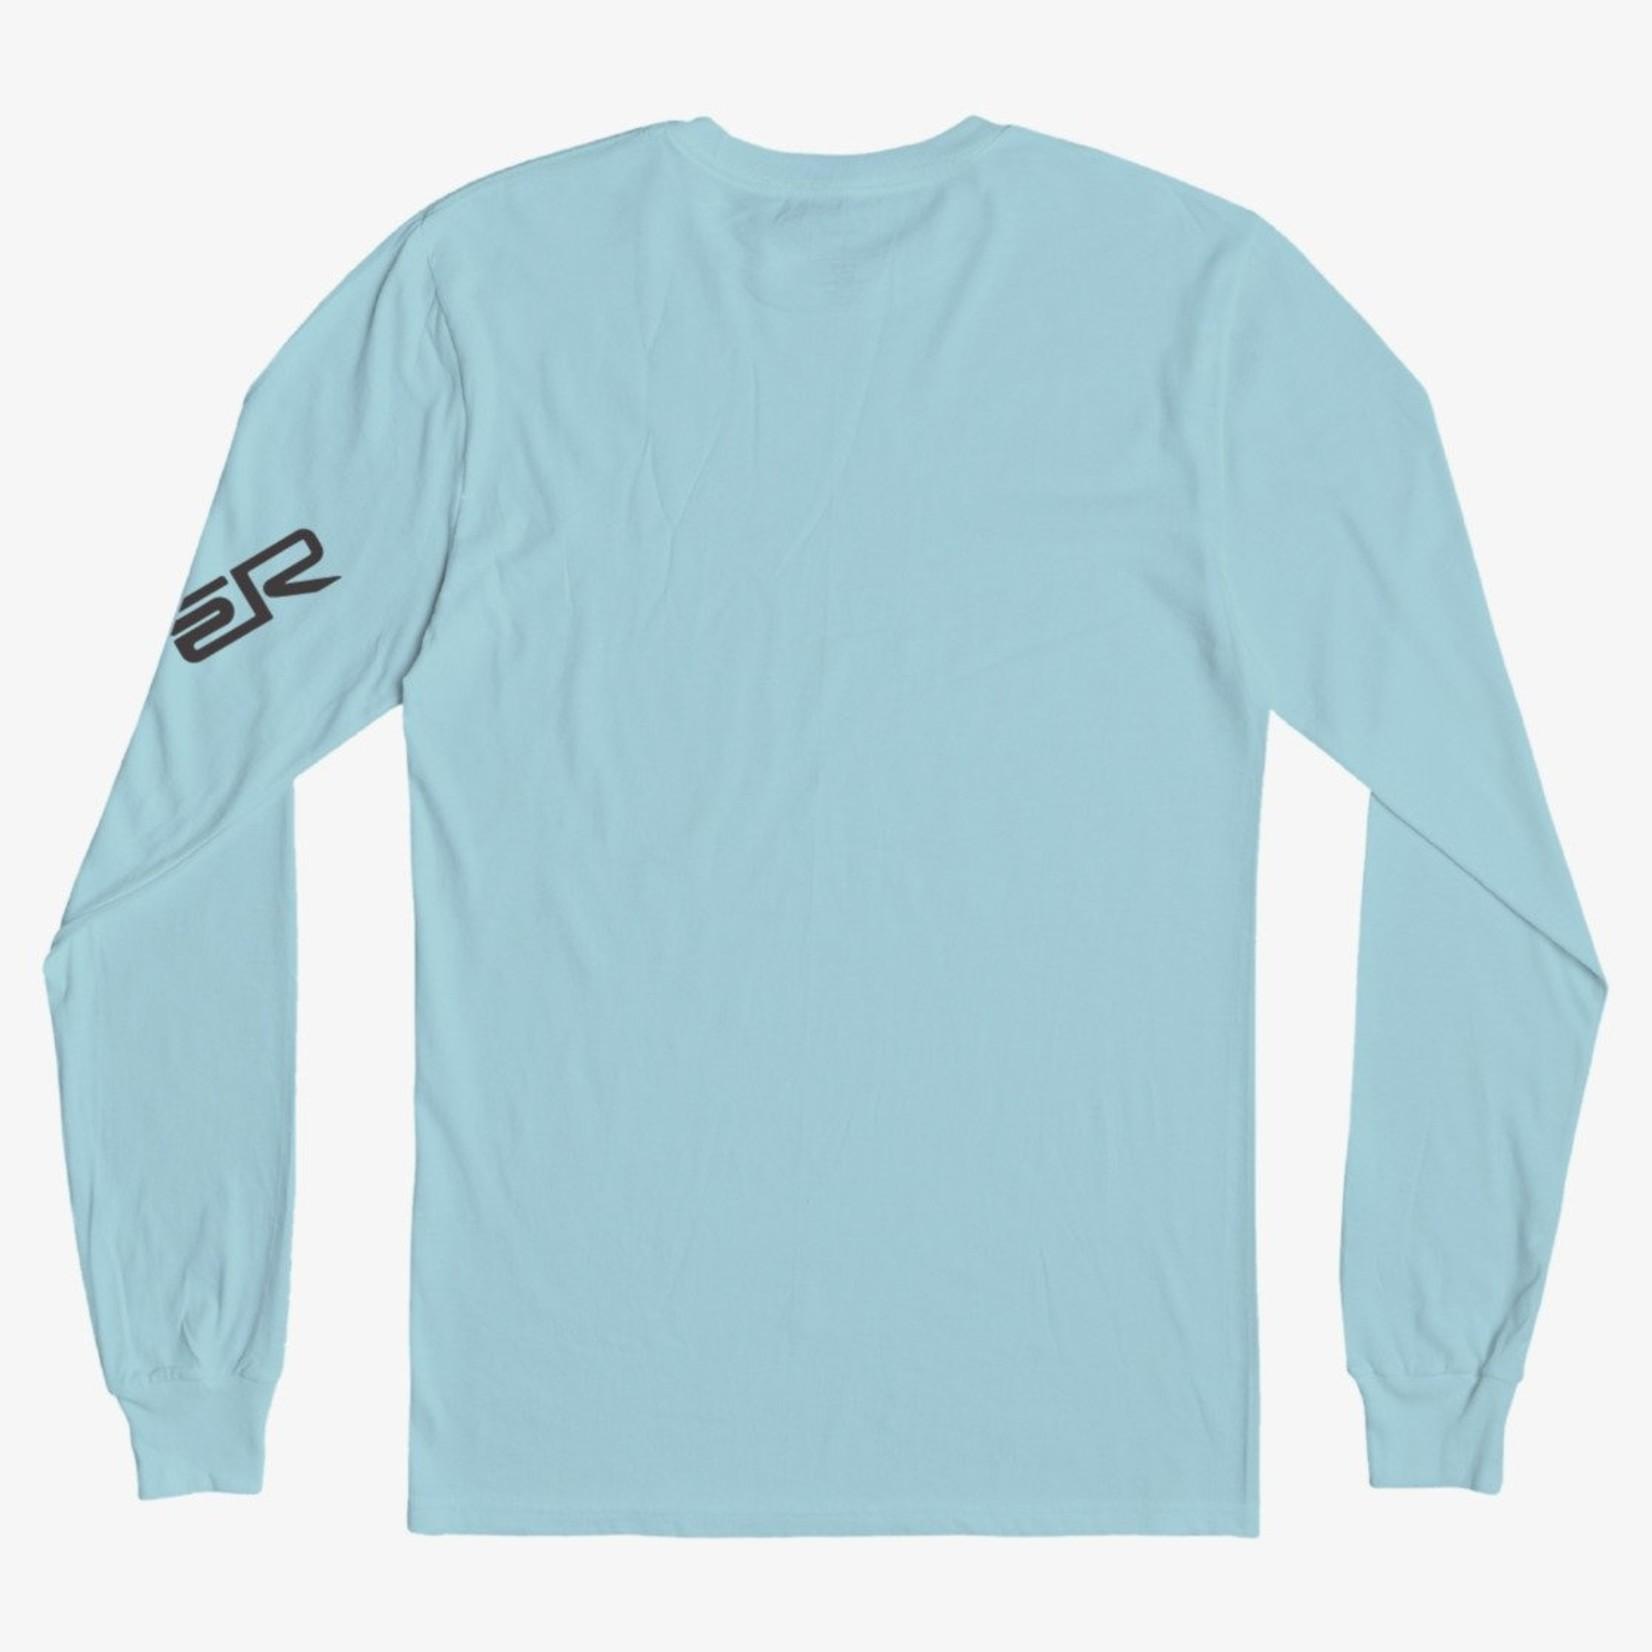 Quiksilver Quiksilver Omni Logo LS T-Shirt